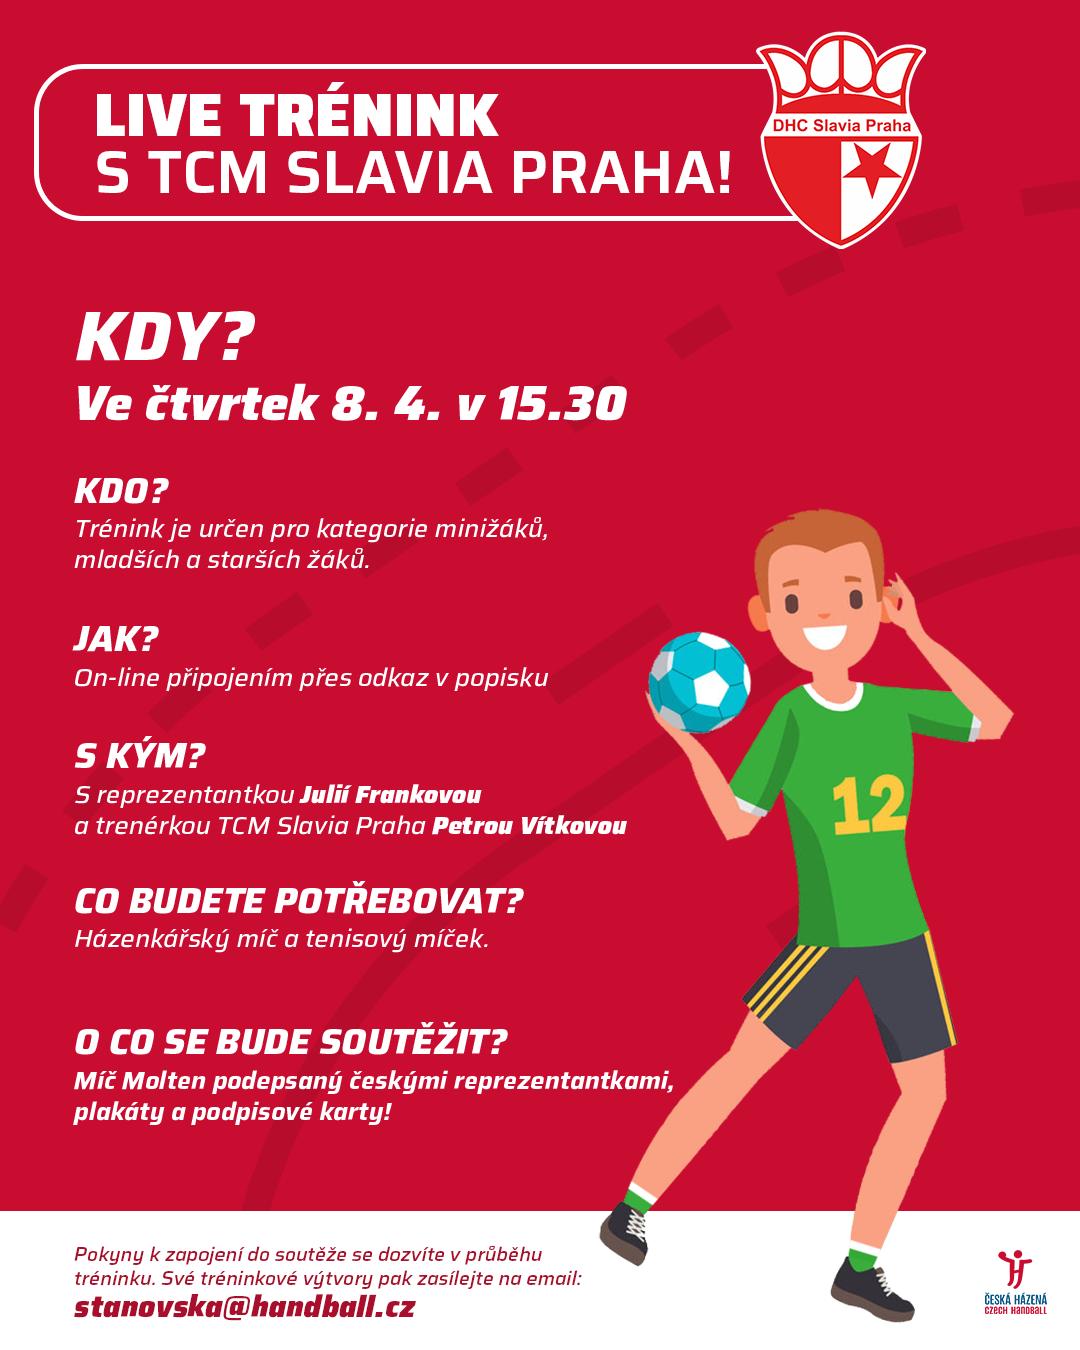 Live trénink 2 – tentokrát s TCM Slavia Praha a reprezentantkou Julií Frankovou!